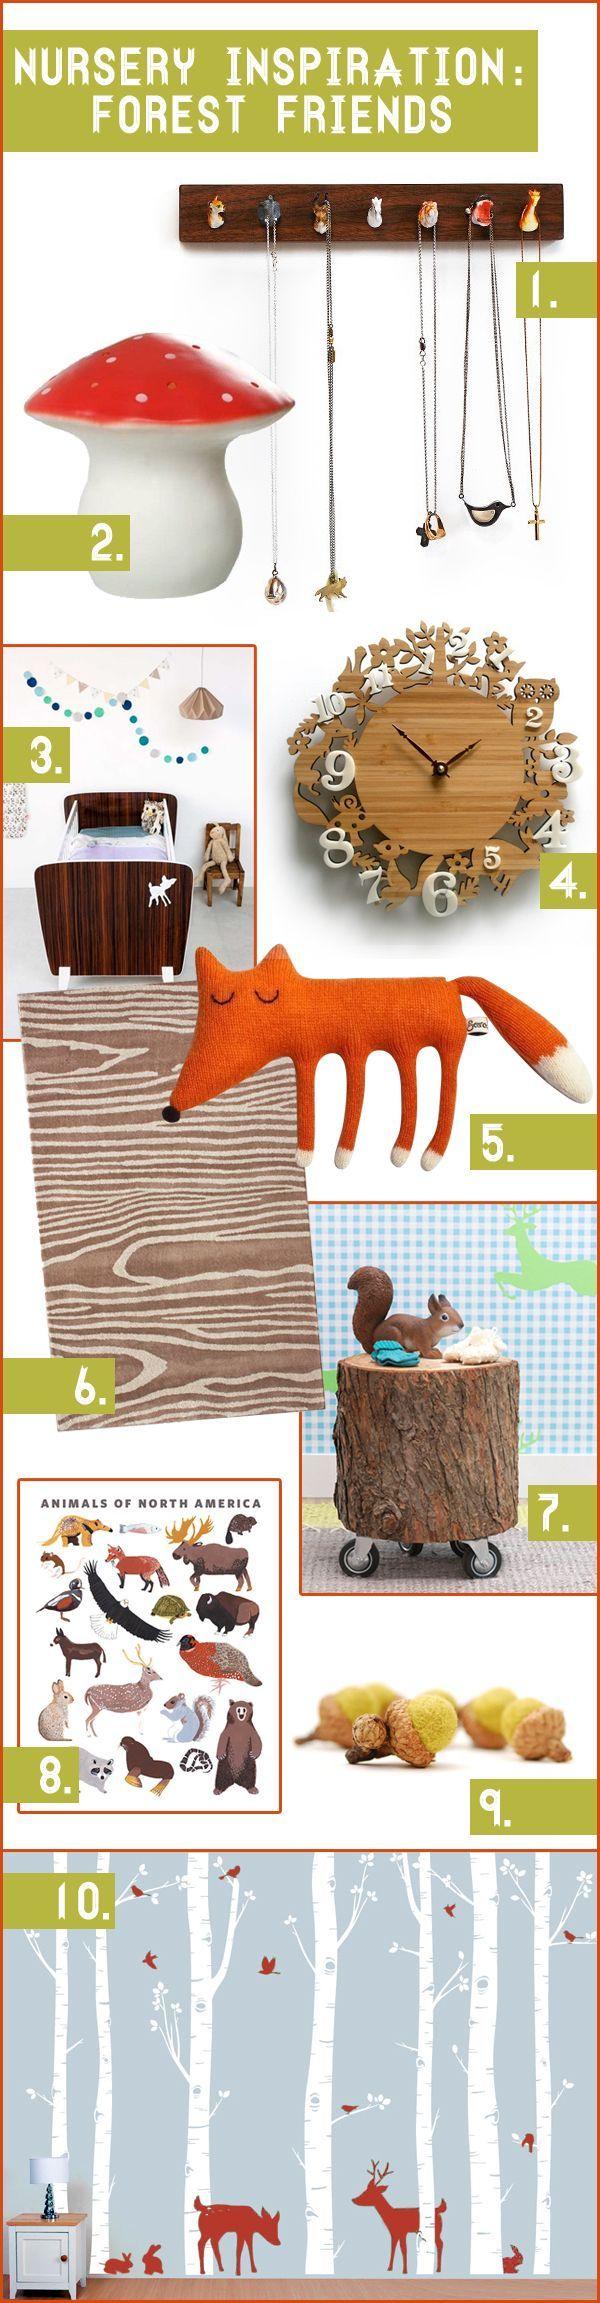 Woodland nursery inspiration : Forest Friends